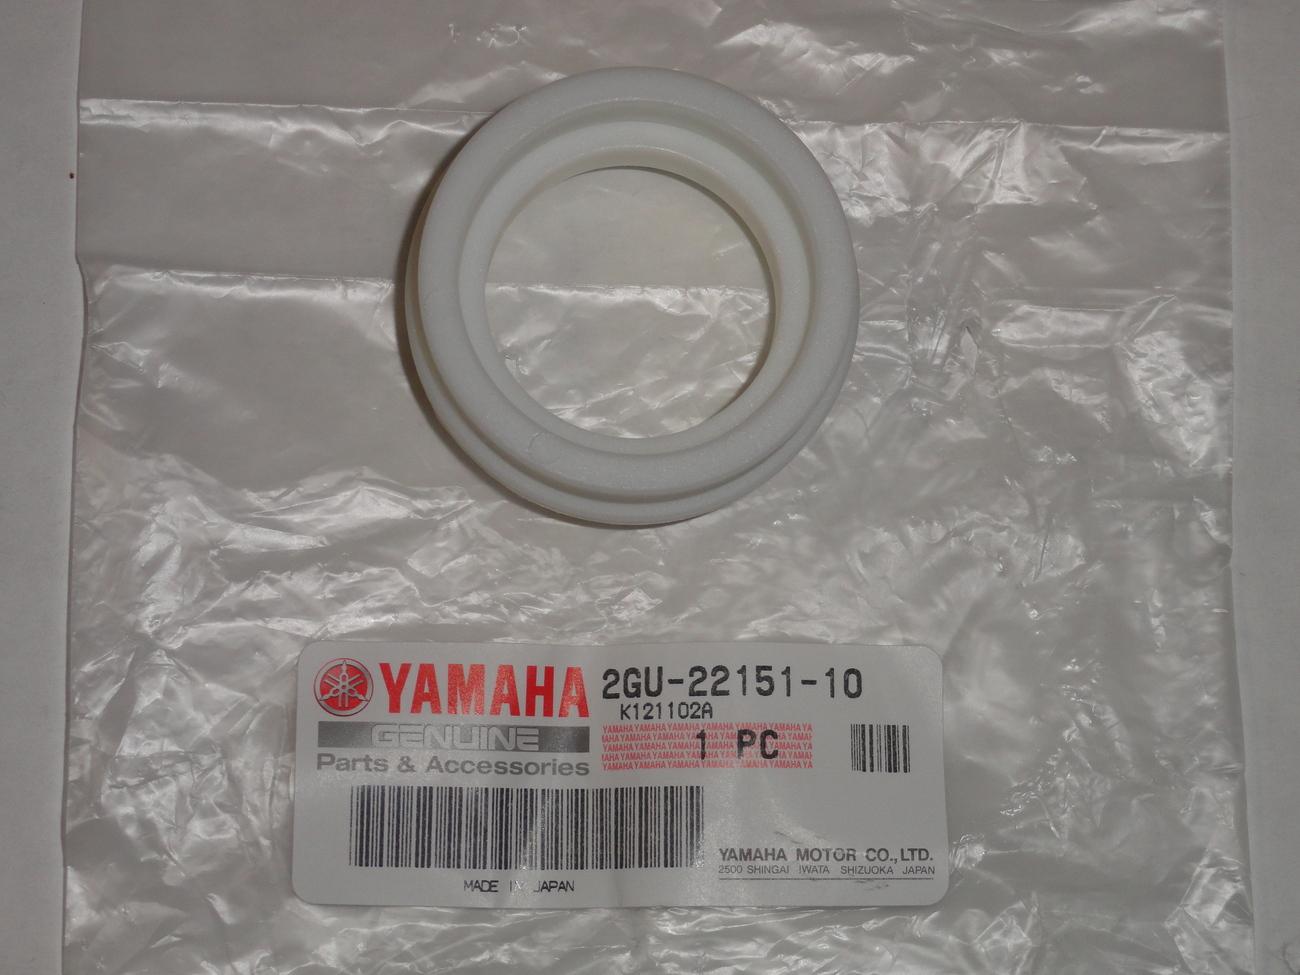 For Yamaha Banshee YFZ350 Chain Roller Swing Arm Guide Guard Seal 2GU-22151-10-00